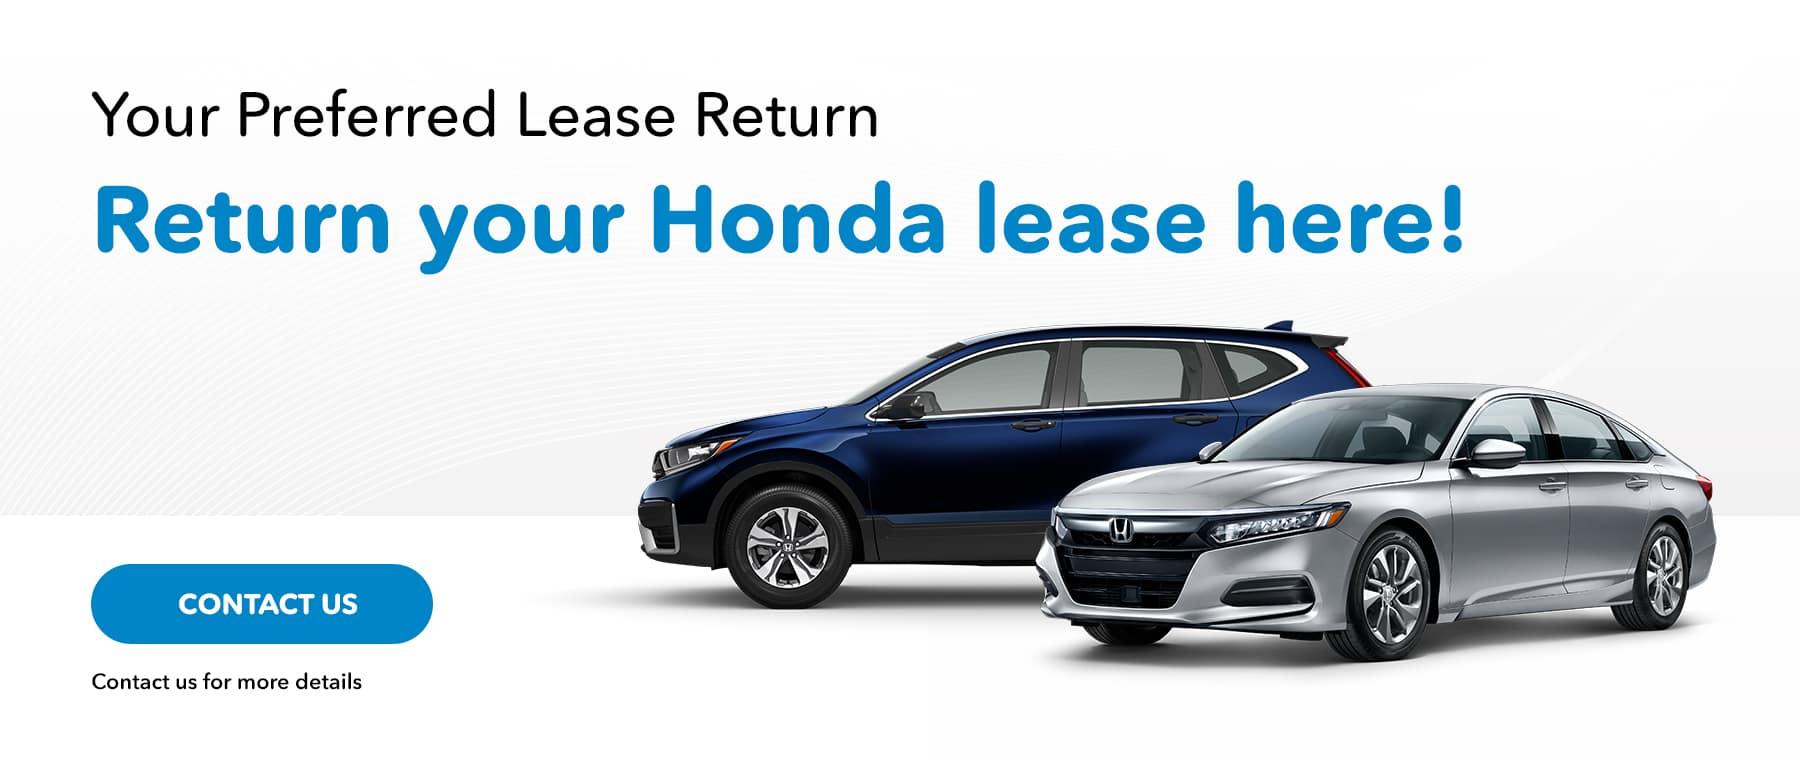 Your Preferred Lease Return, Return your Honda lease here!